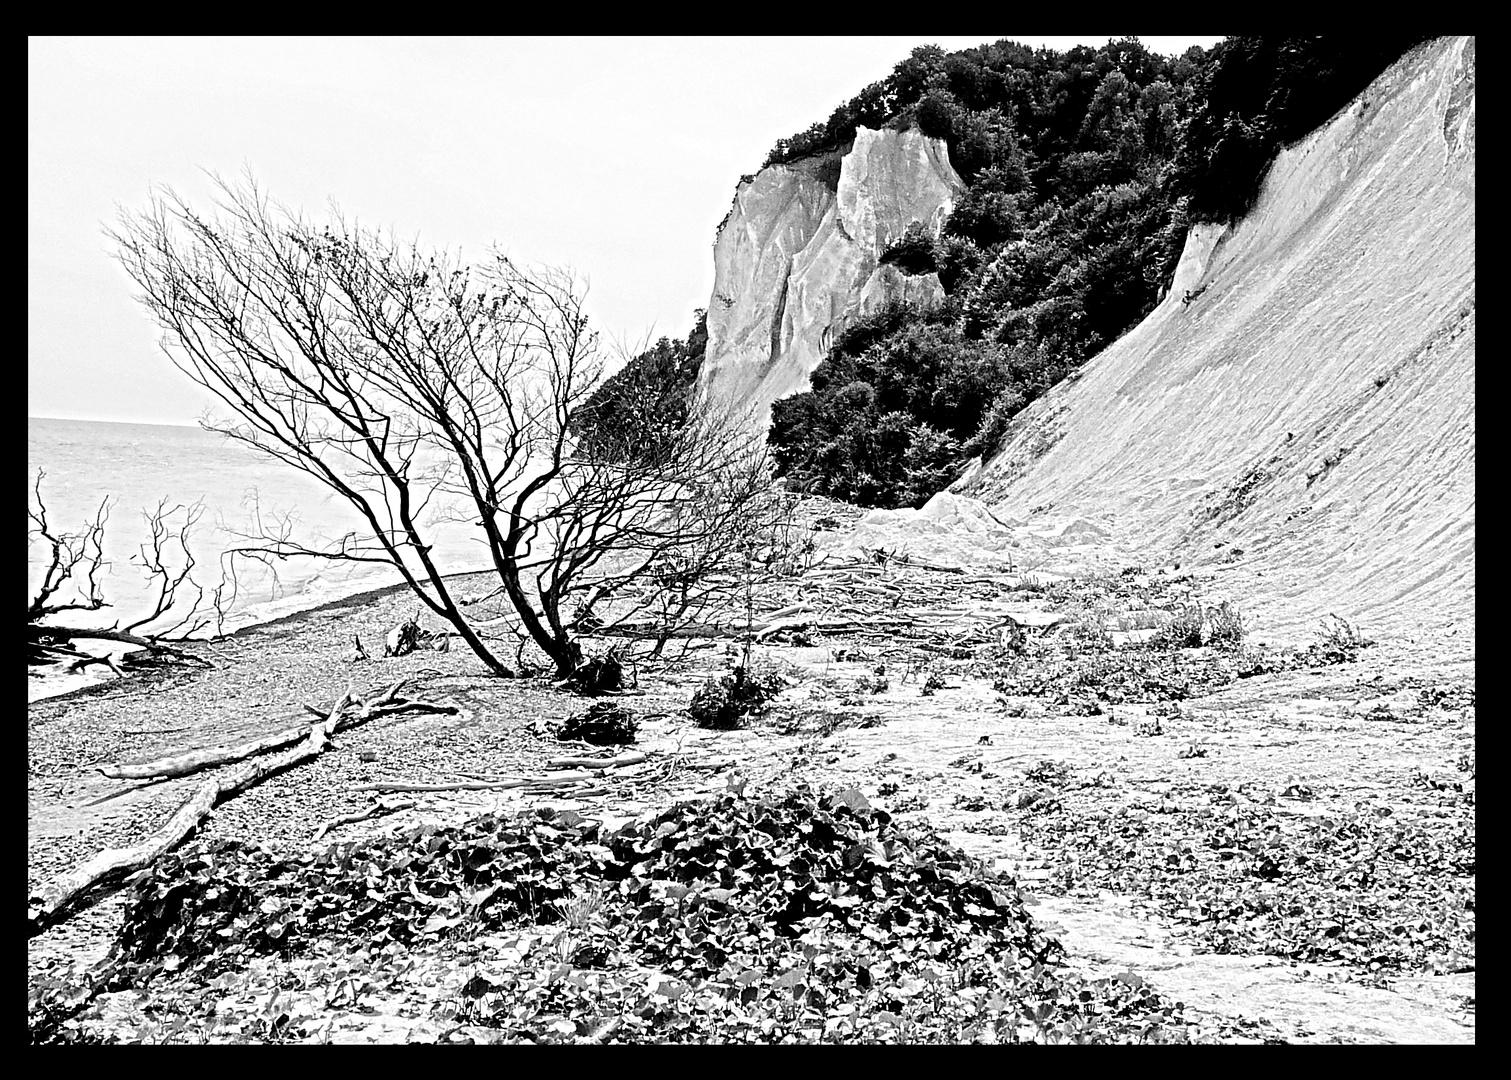 Kreidefelsen auf der Insel Moen